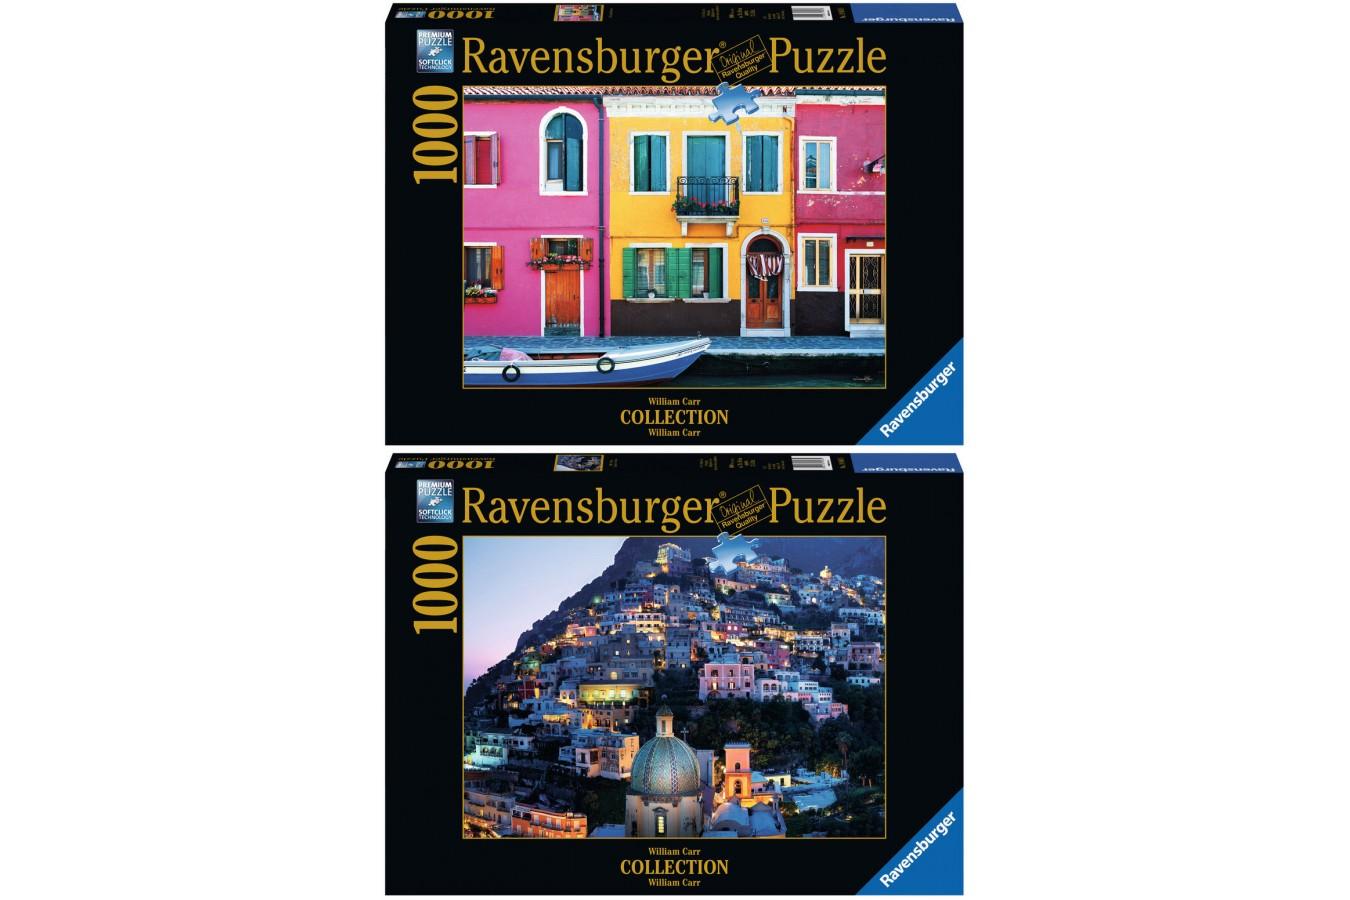 Pachet Promo Ravensburger Burano + Positano, 2x1.000 piese